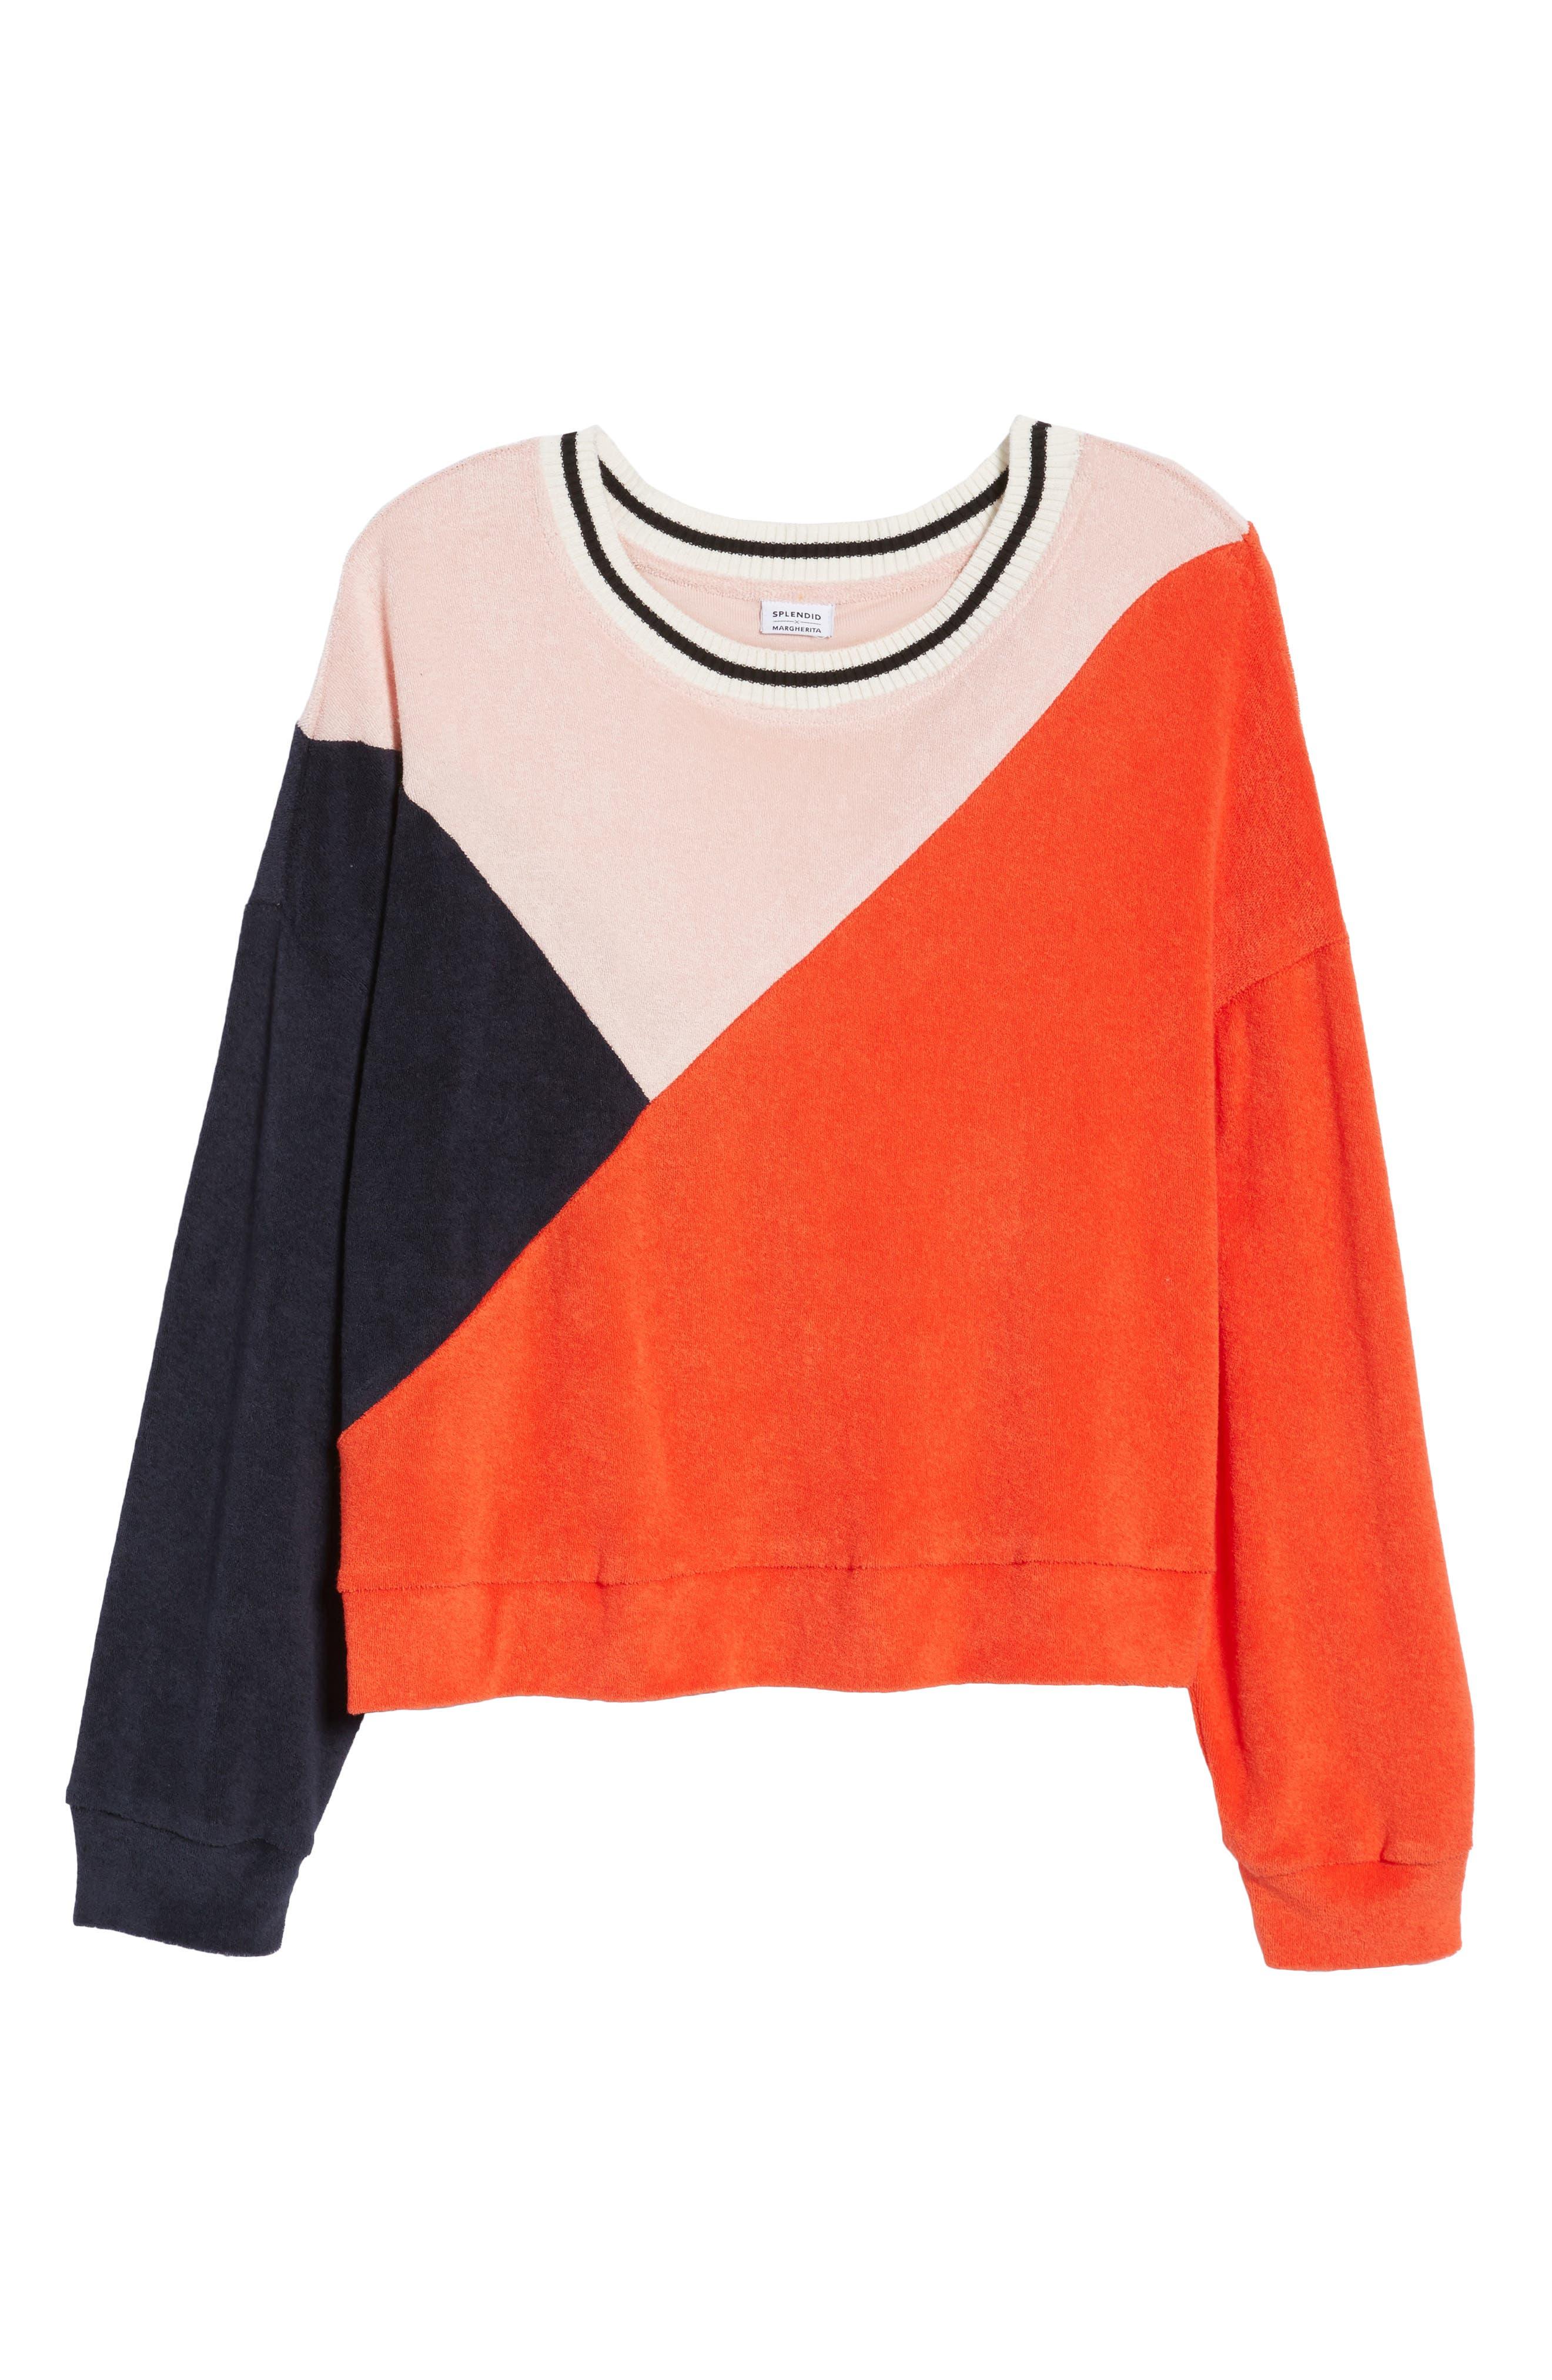 x Margherita Sportivo French Terry Sweatshirt,                             Alternate thumbnail 6, color,                             602